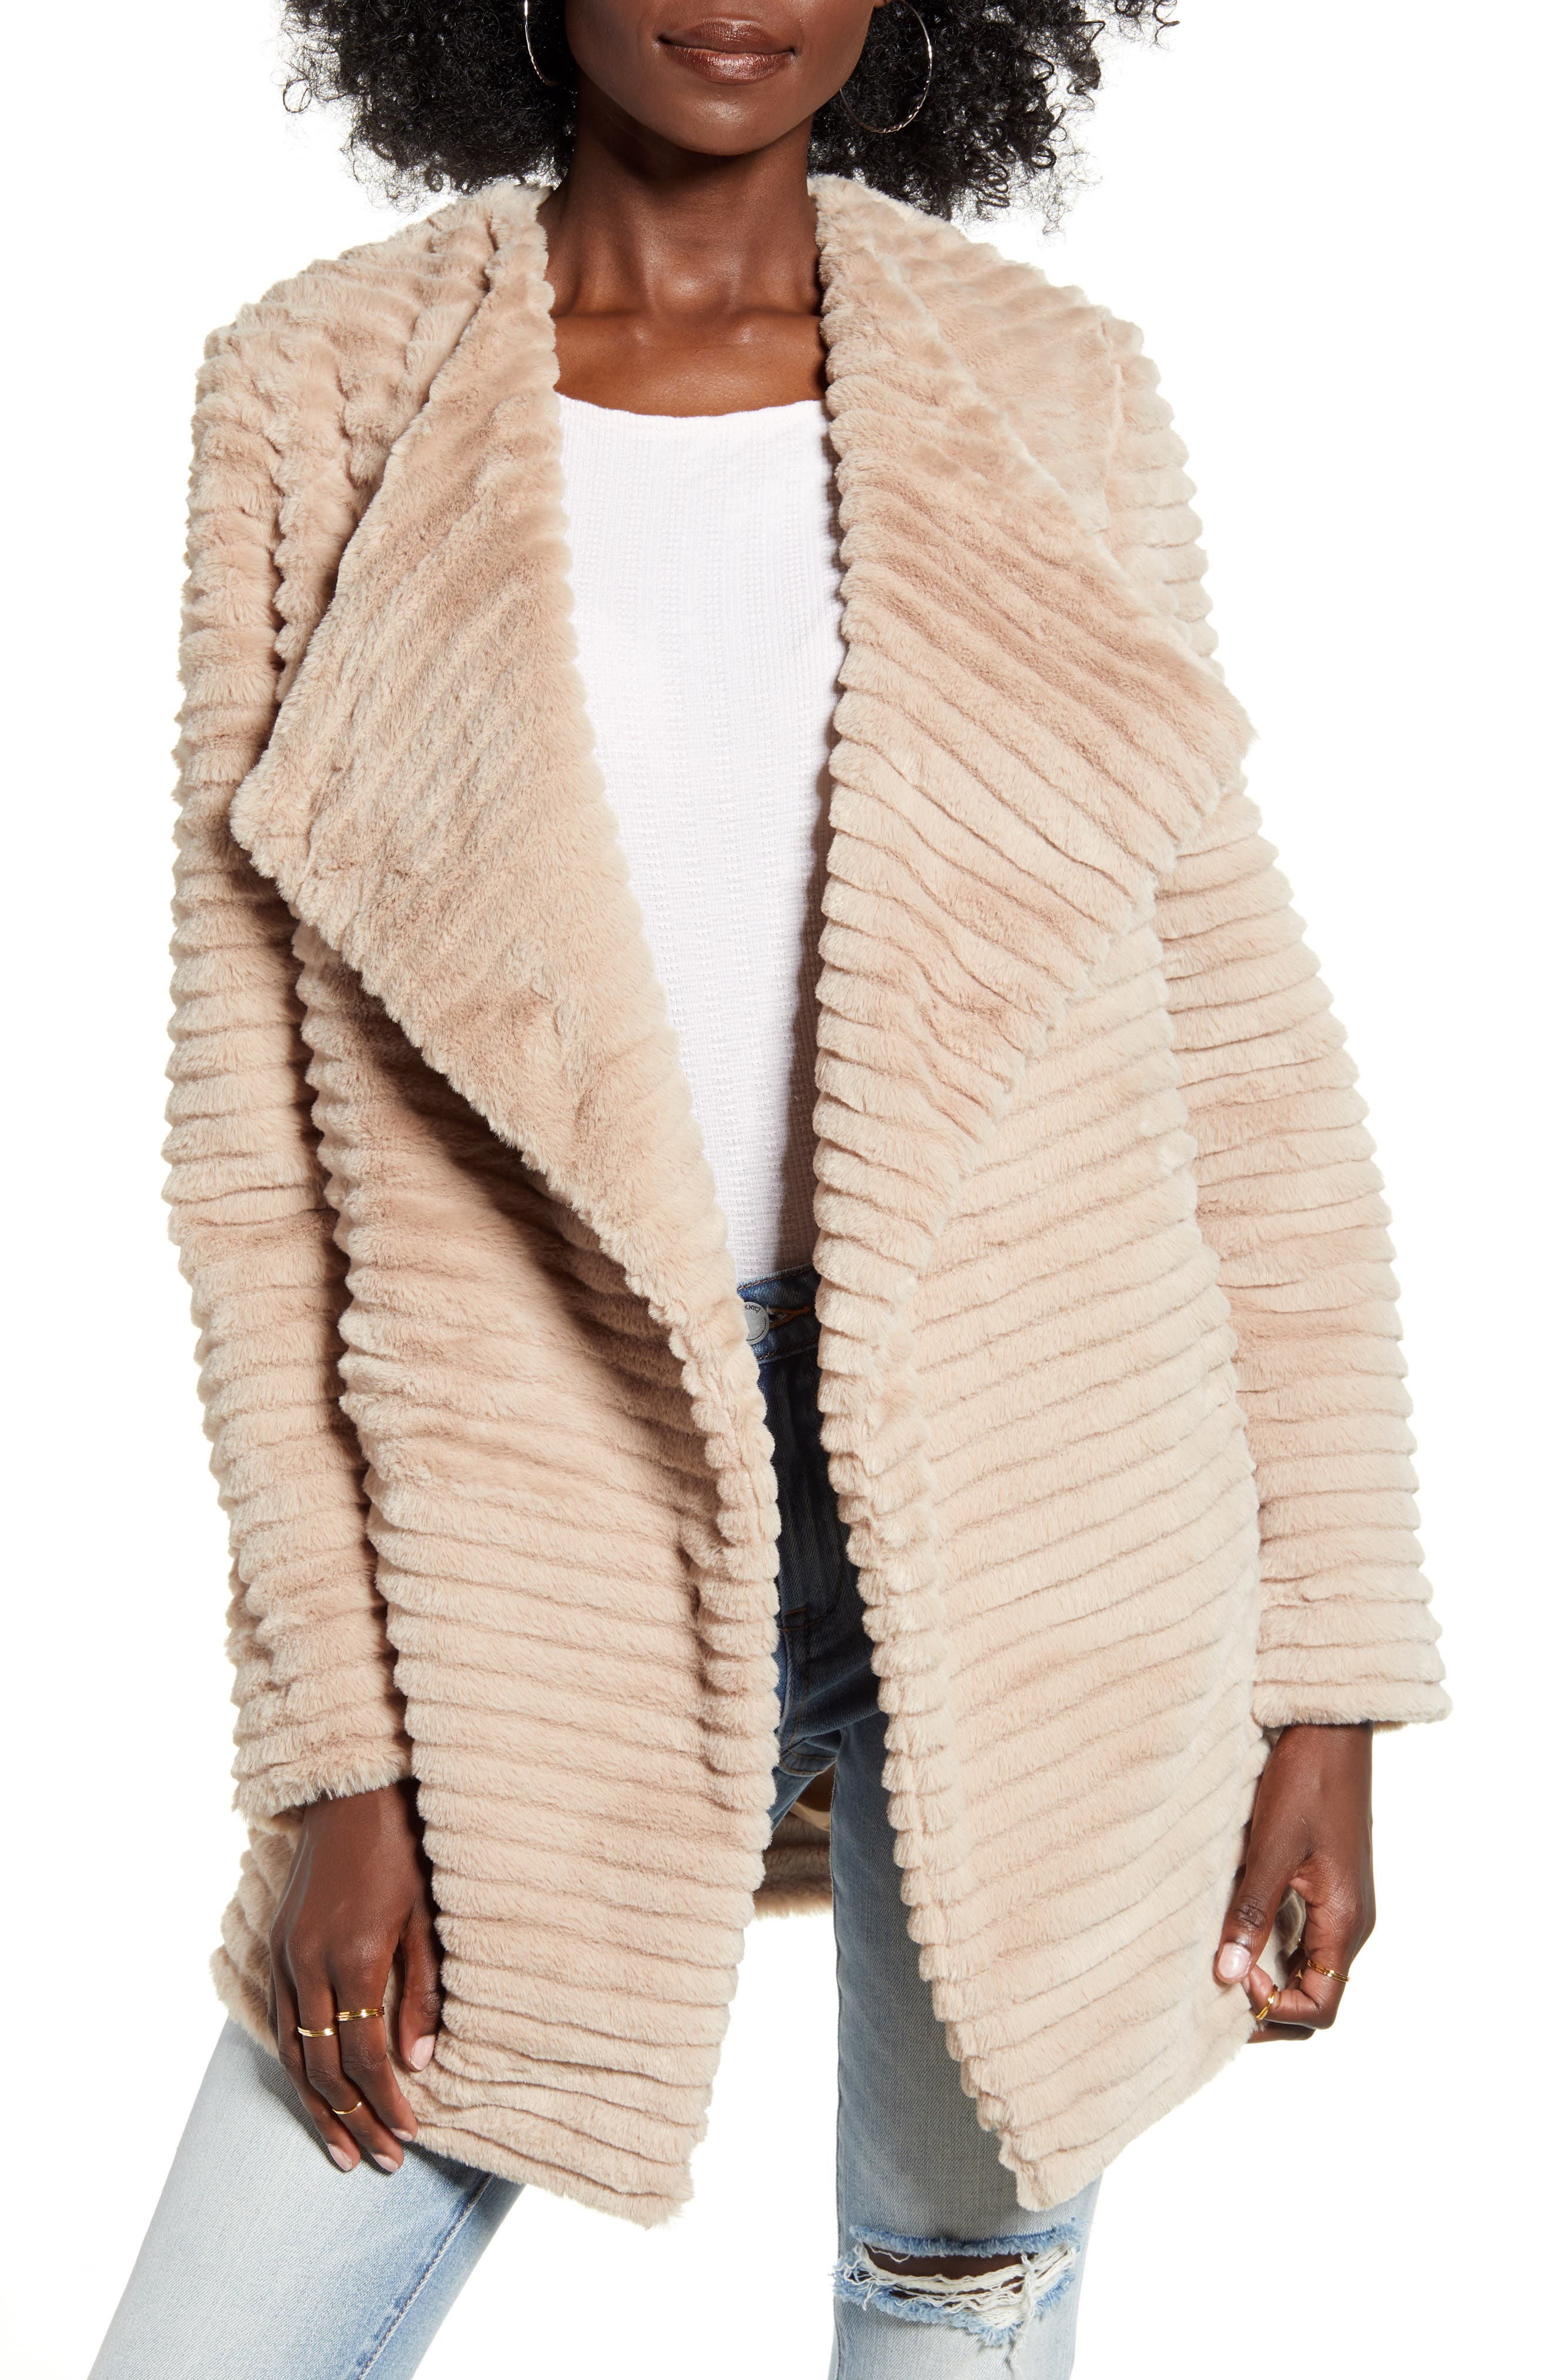 Image of BB Dakota Fab Moment Faux Fur Jacket